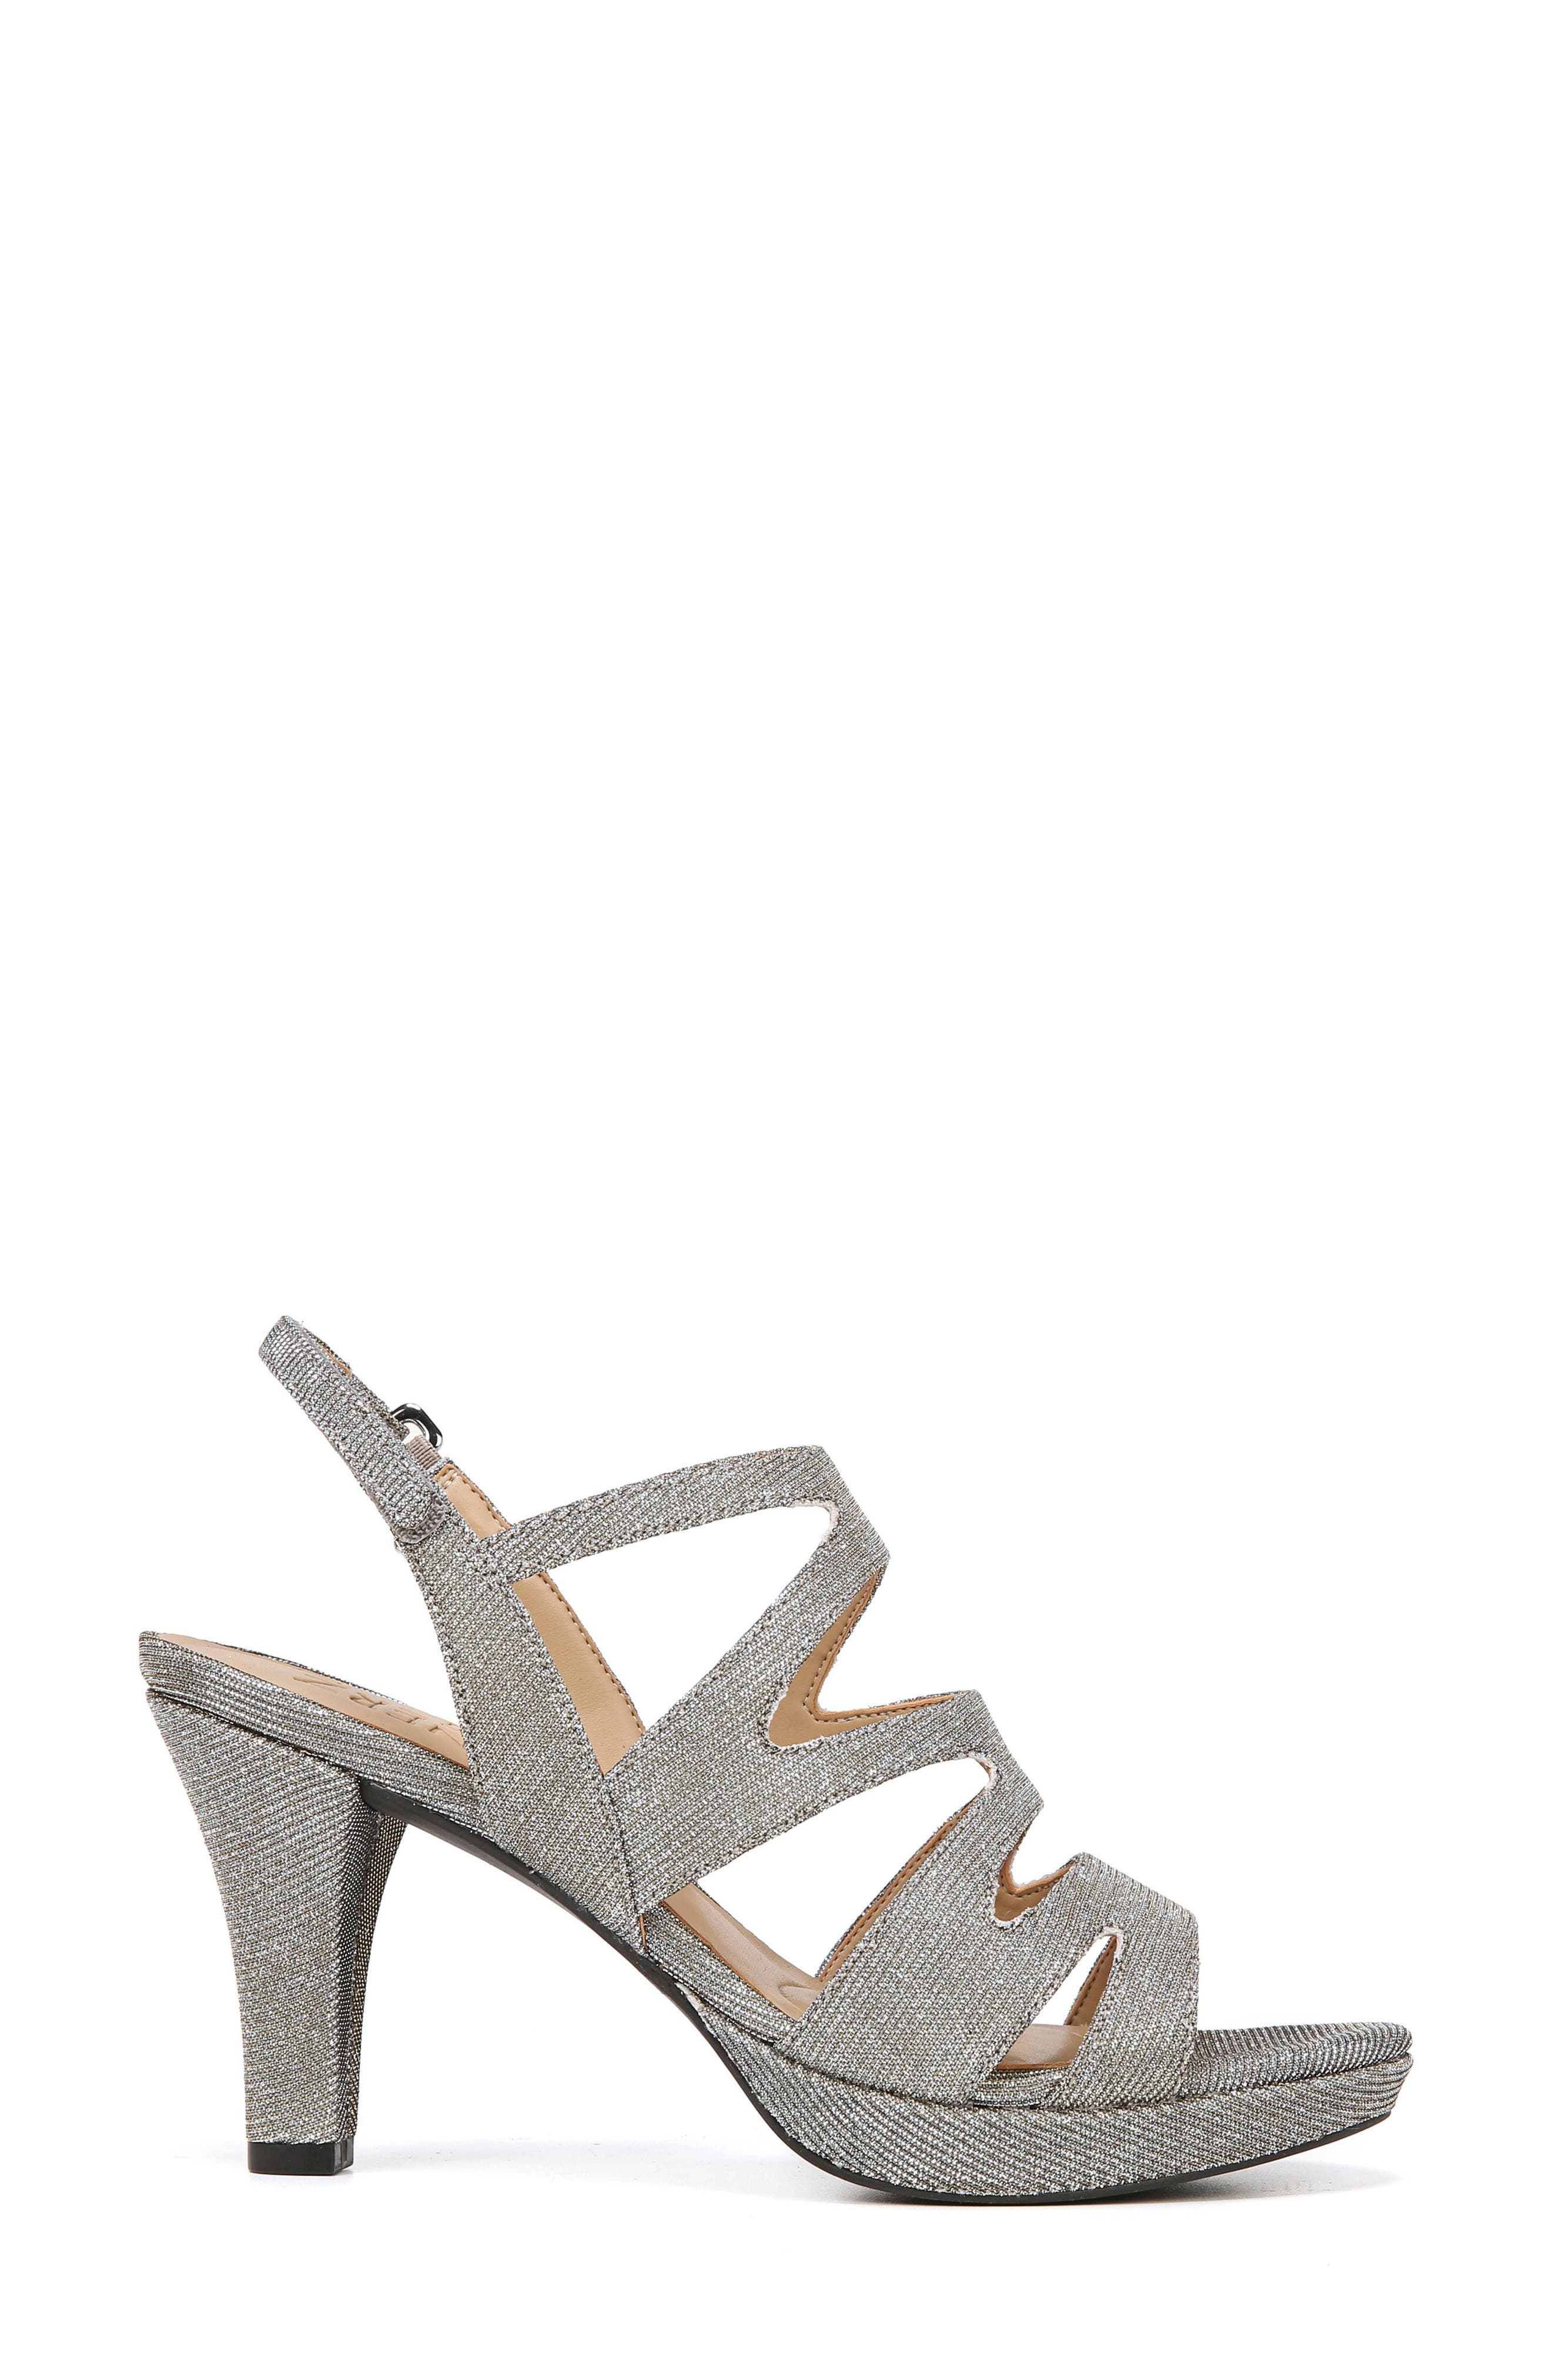 'Pressley' Slingback Platform Sandal,                             Alternate thumbnail 3, color,                             043